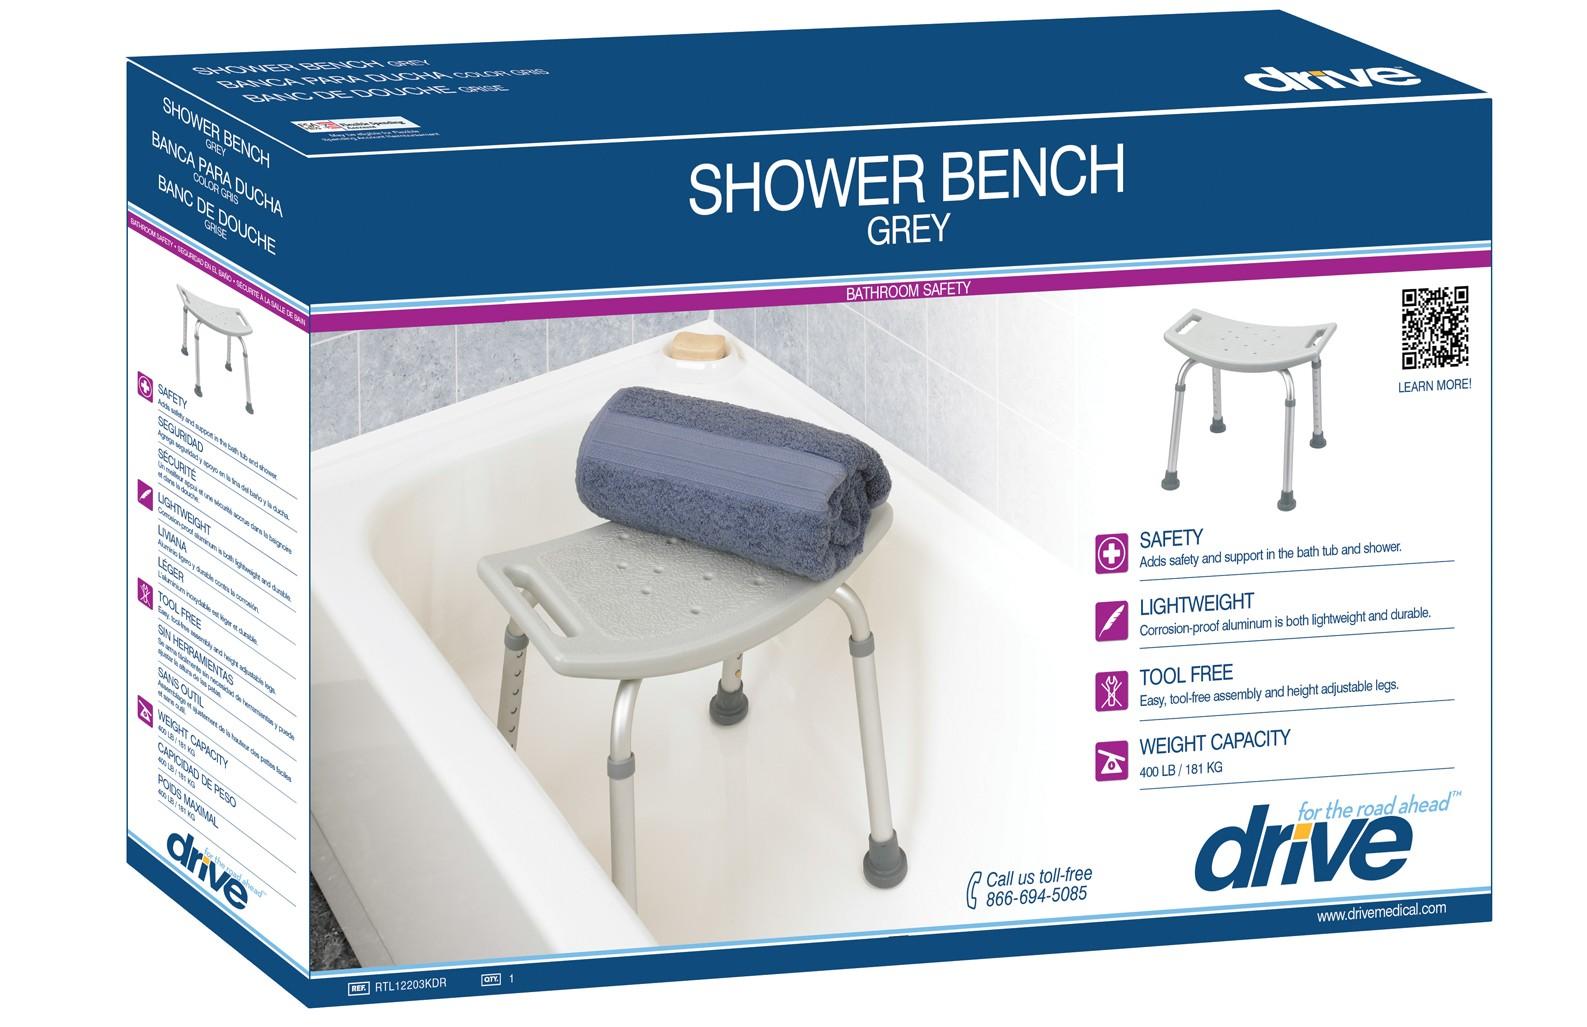 Drive Medical bath bench shower chair